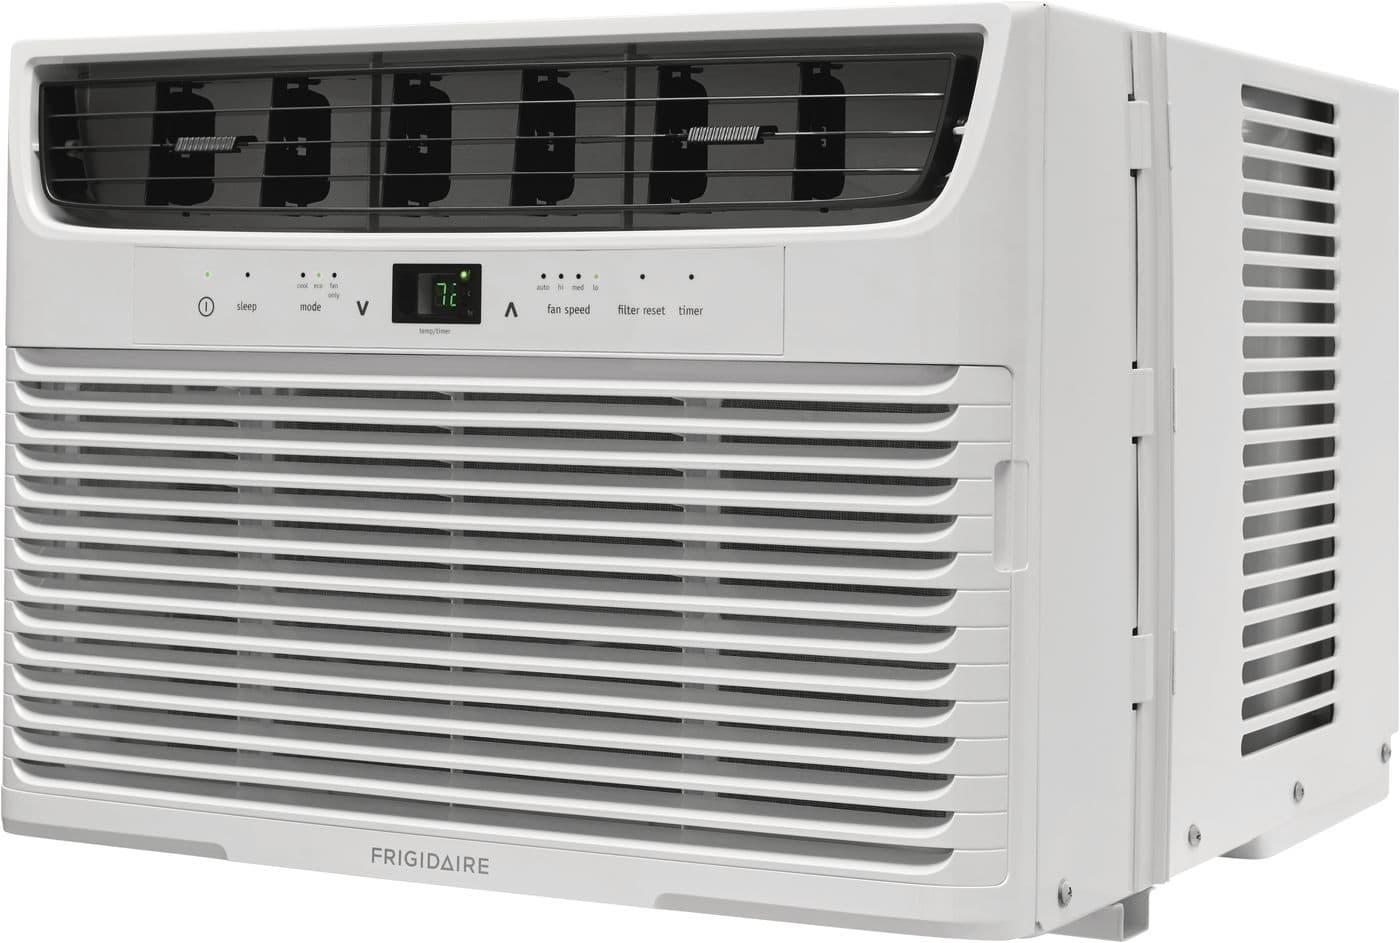 Model: FFRA082ZA1   Frigidaire 8,000 BTU Window-Mounted Room Air Conditioner